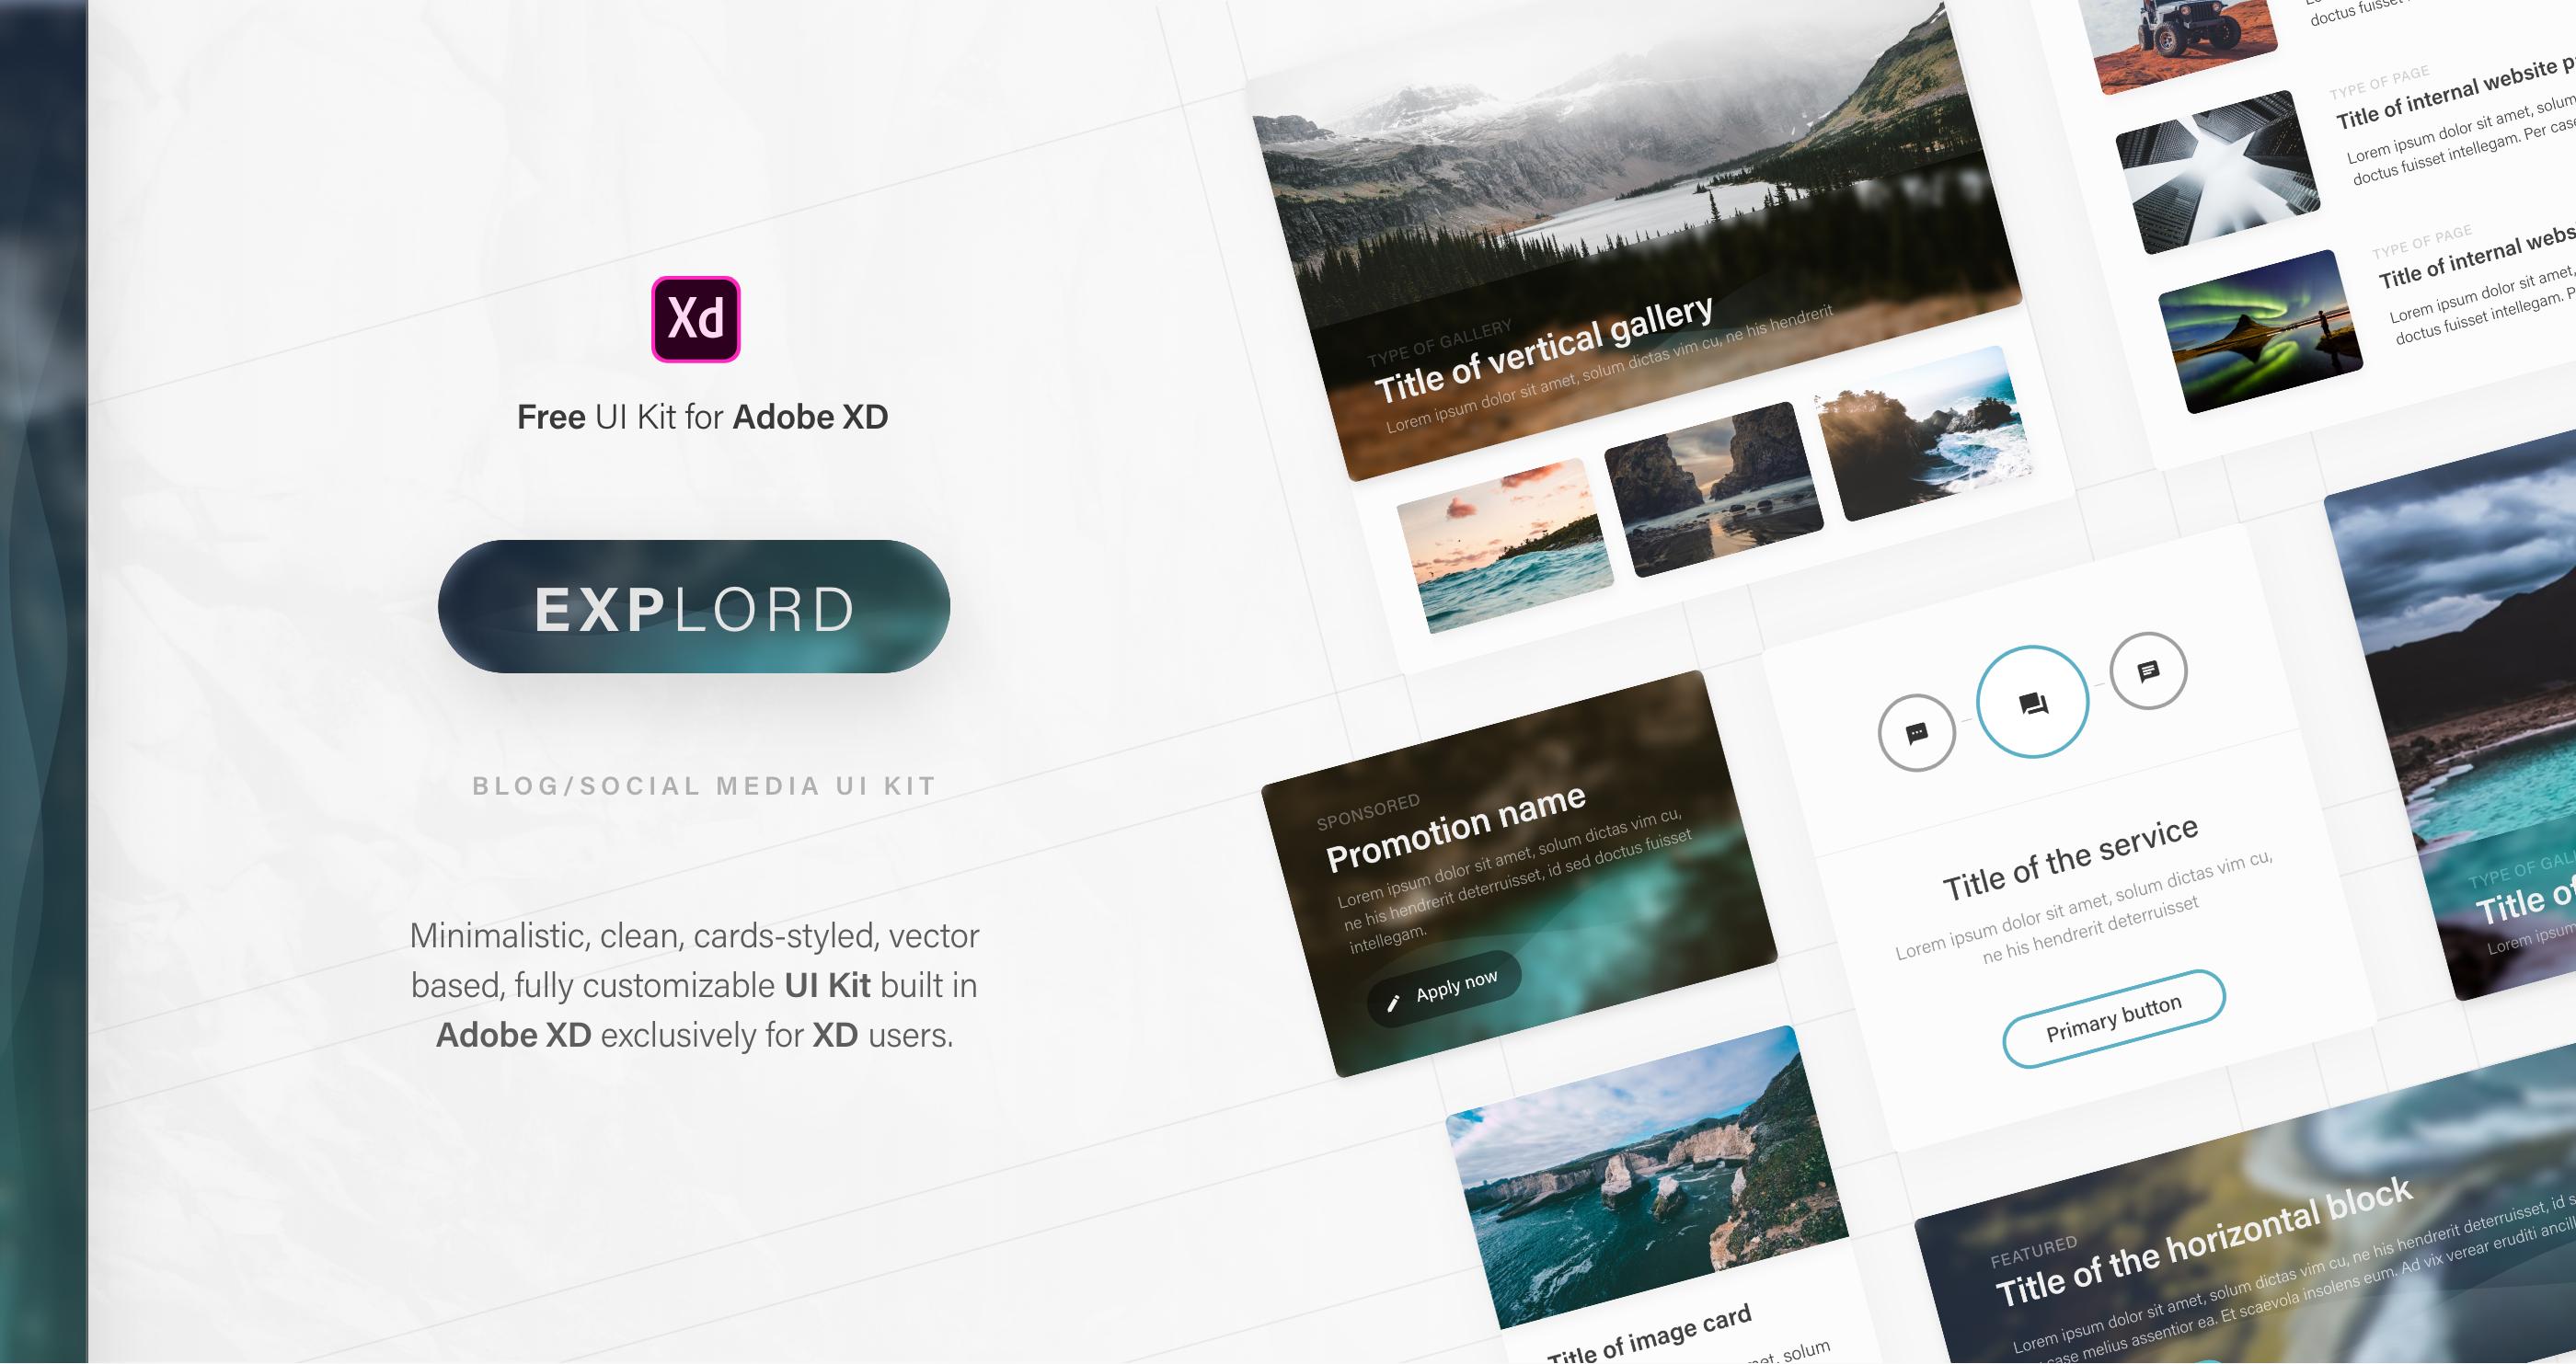 Explord Free Ui Kit For Adobe Xd On Behance